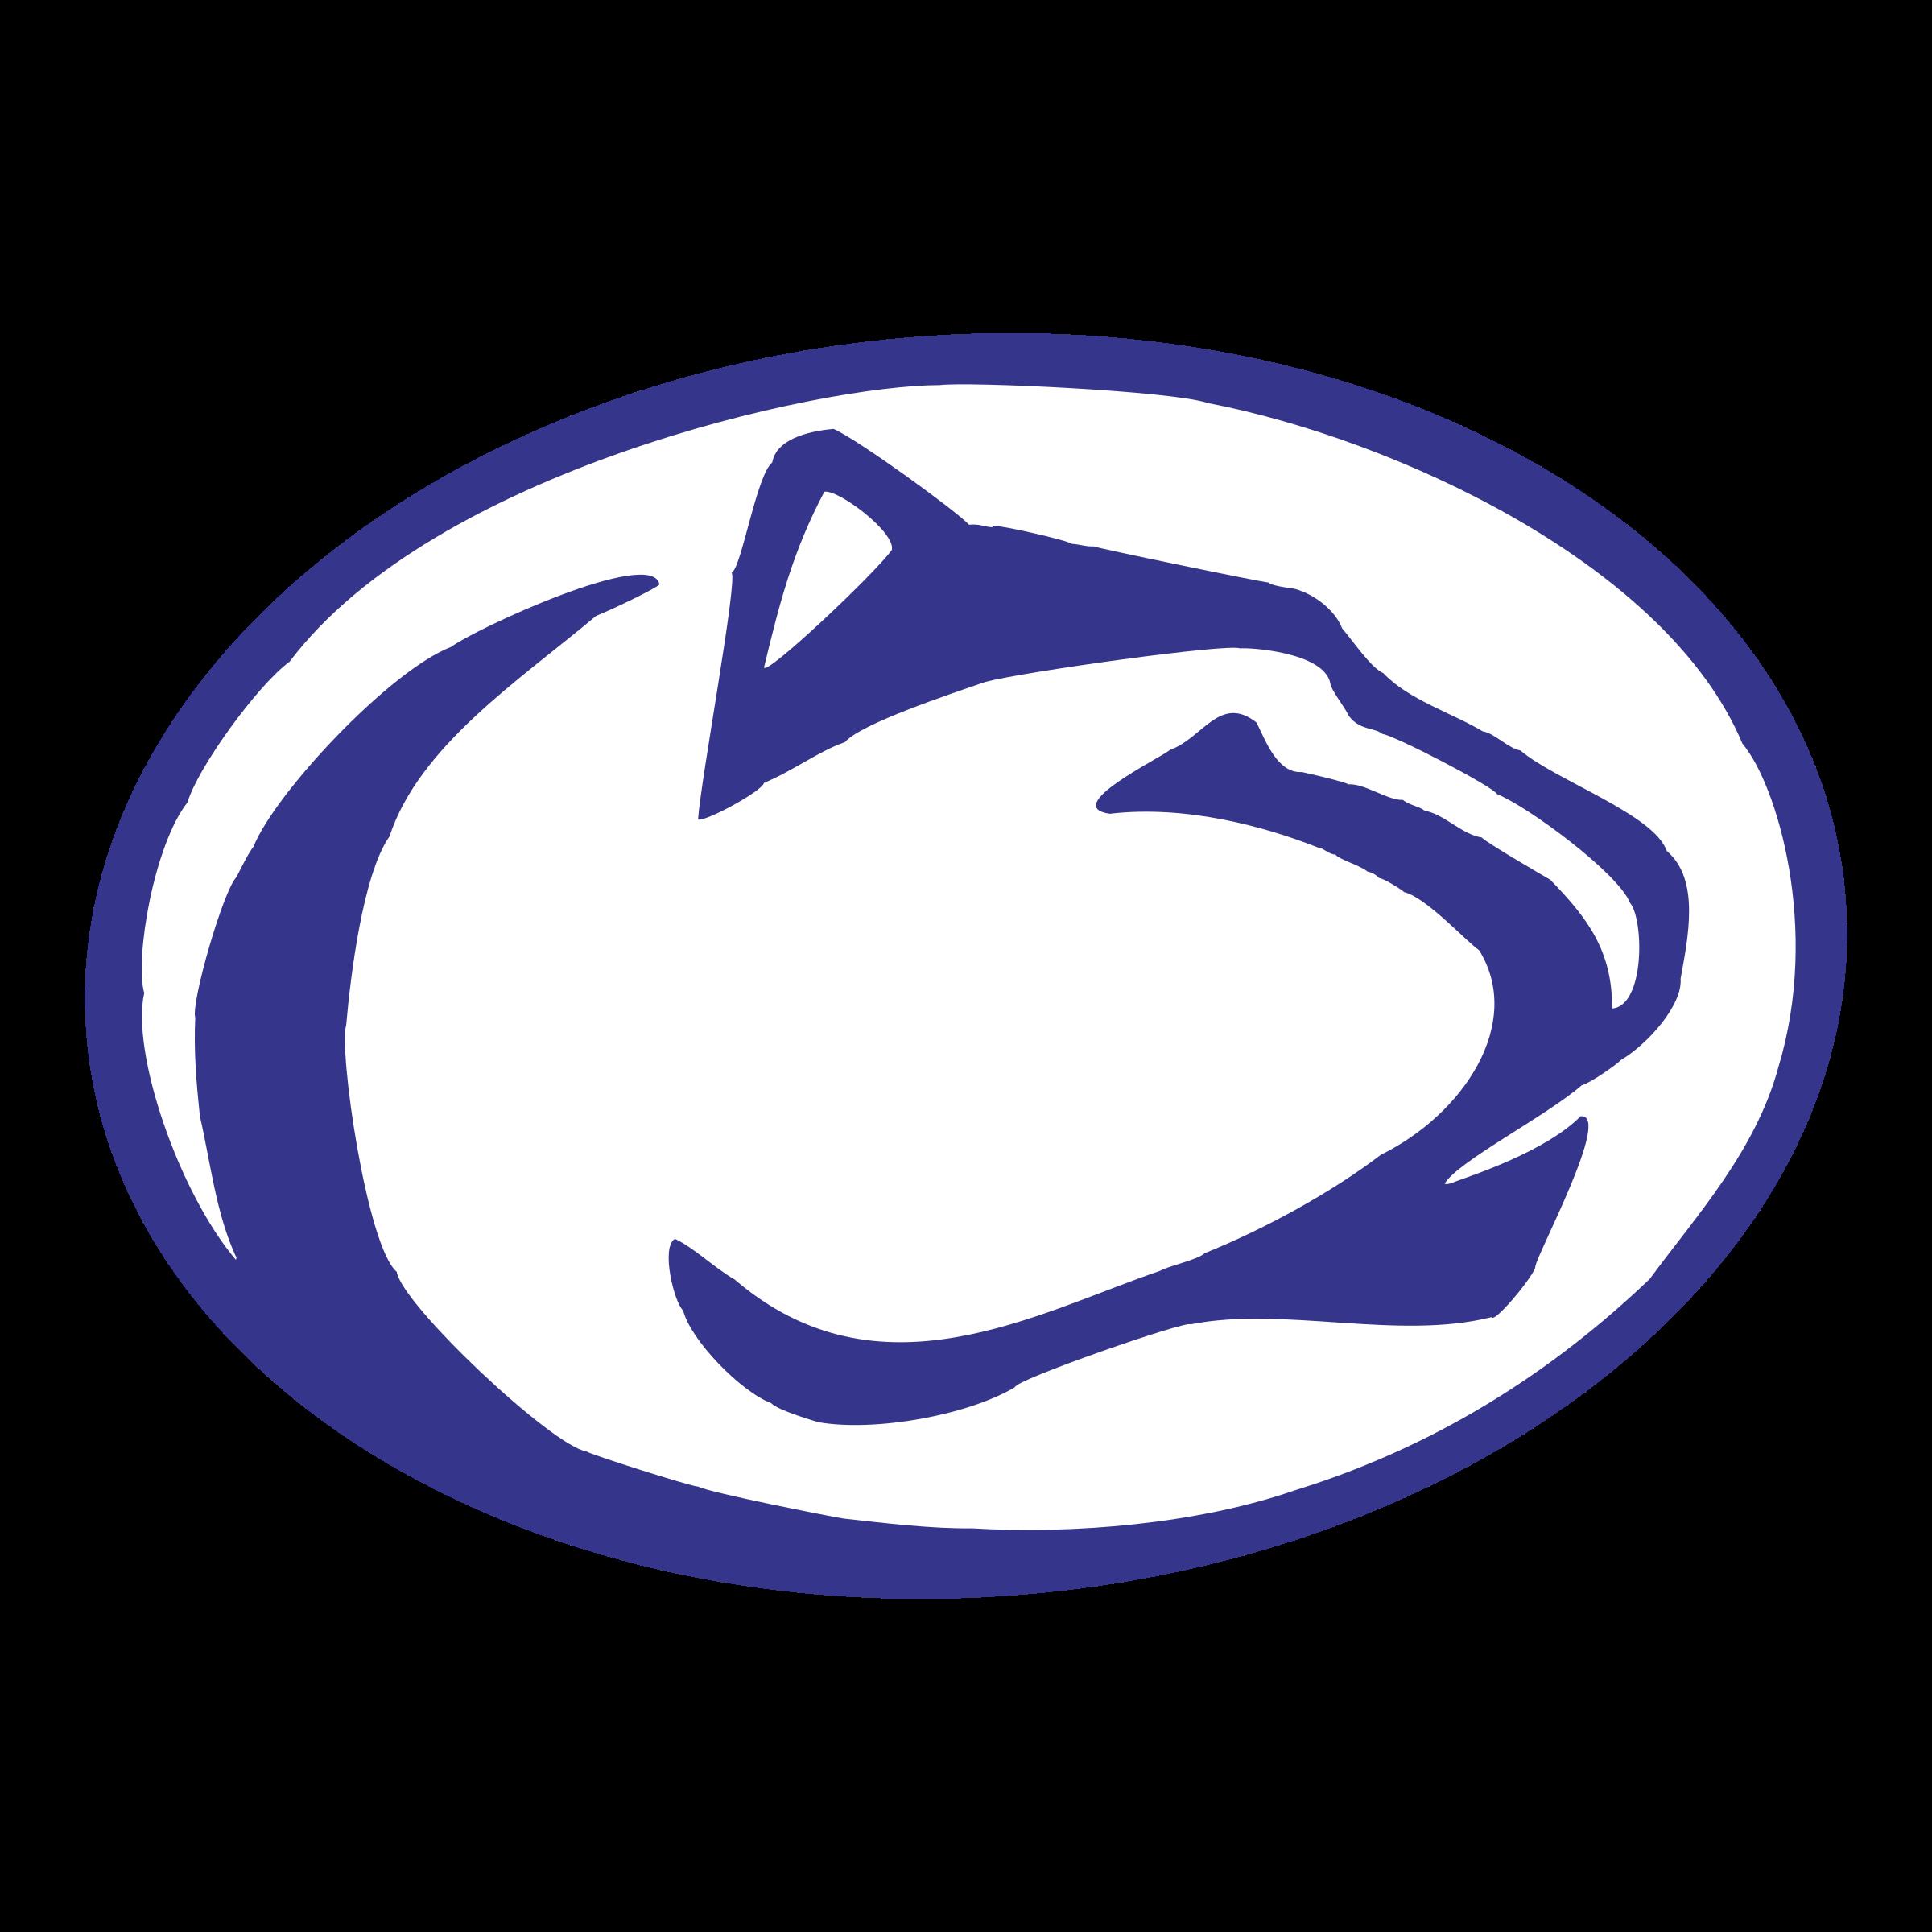 penn state lions logo png transparent svg vector freebie supply rh freebiesupply com penn state logos history penn state logos college of engineering